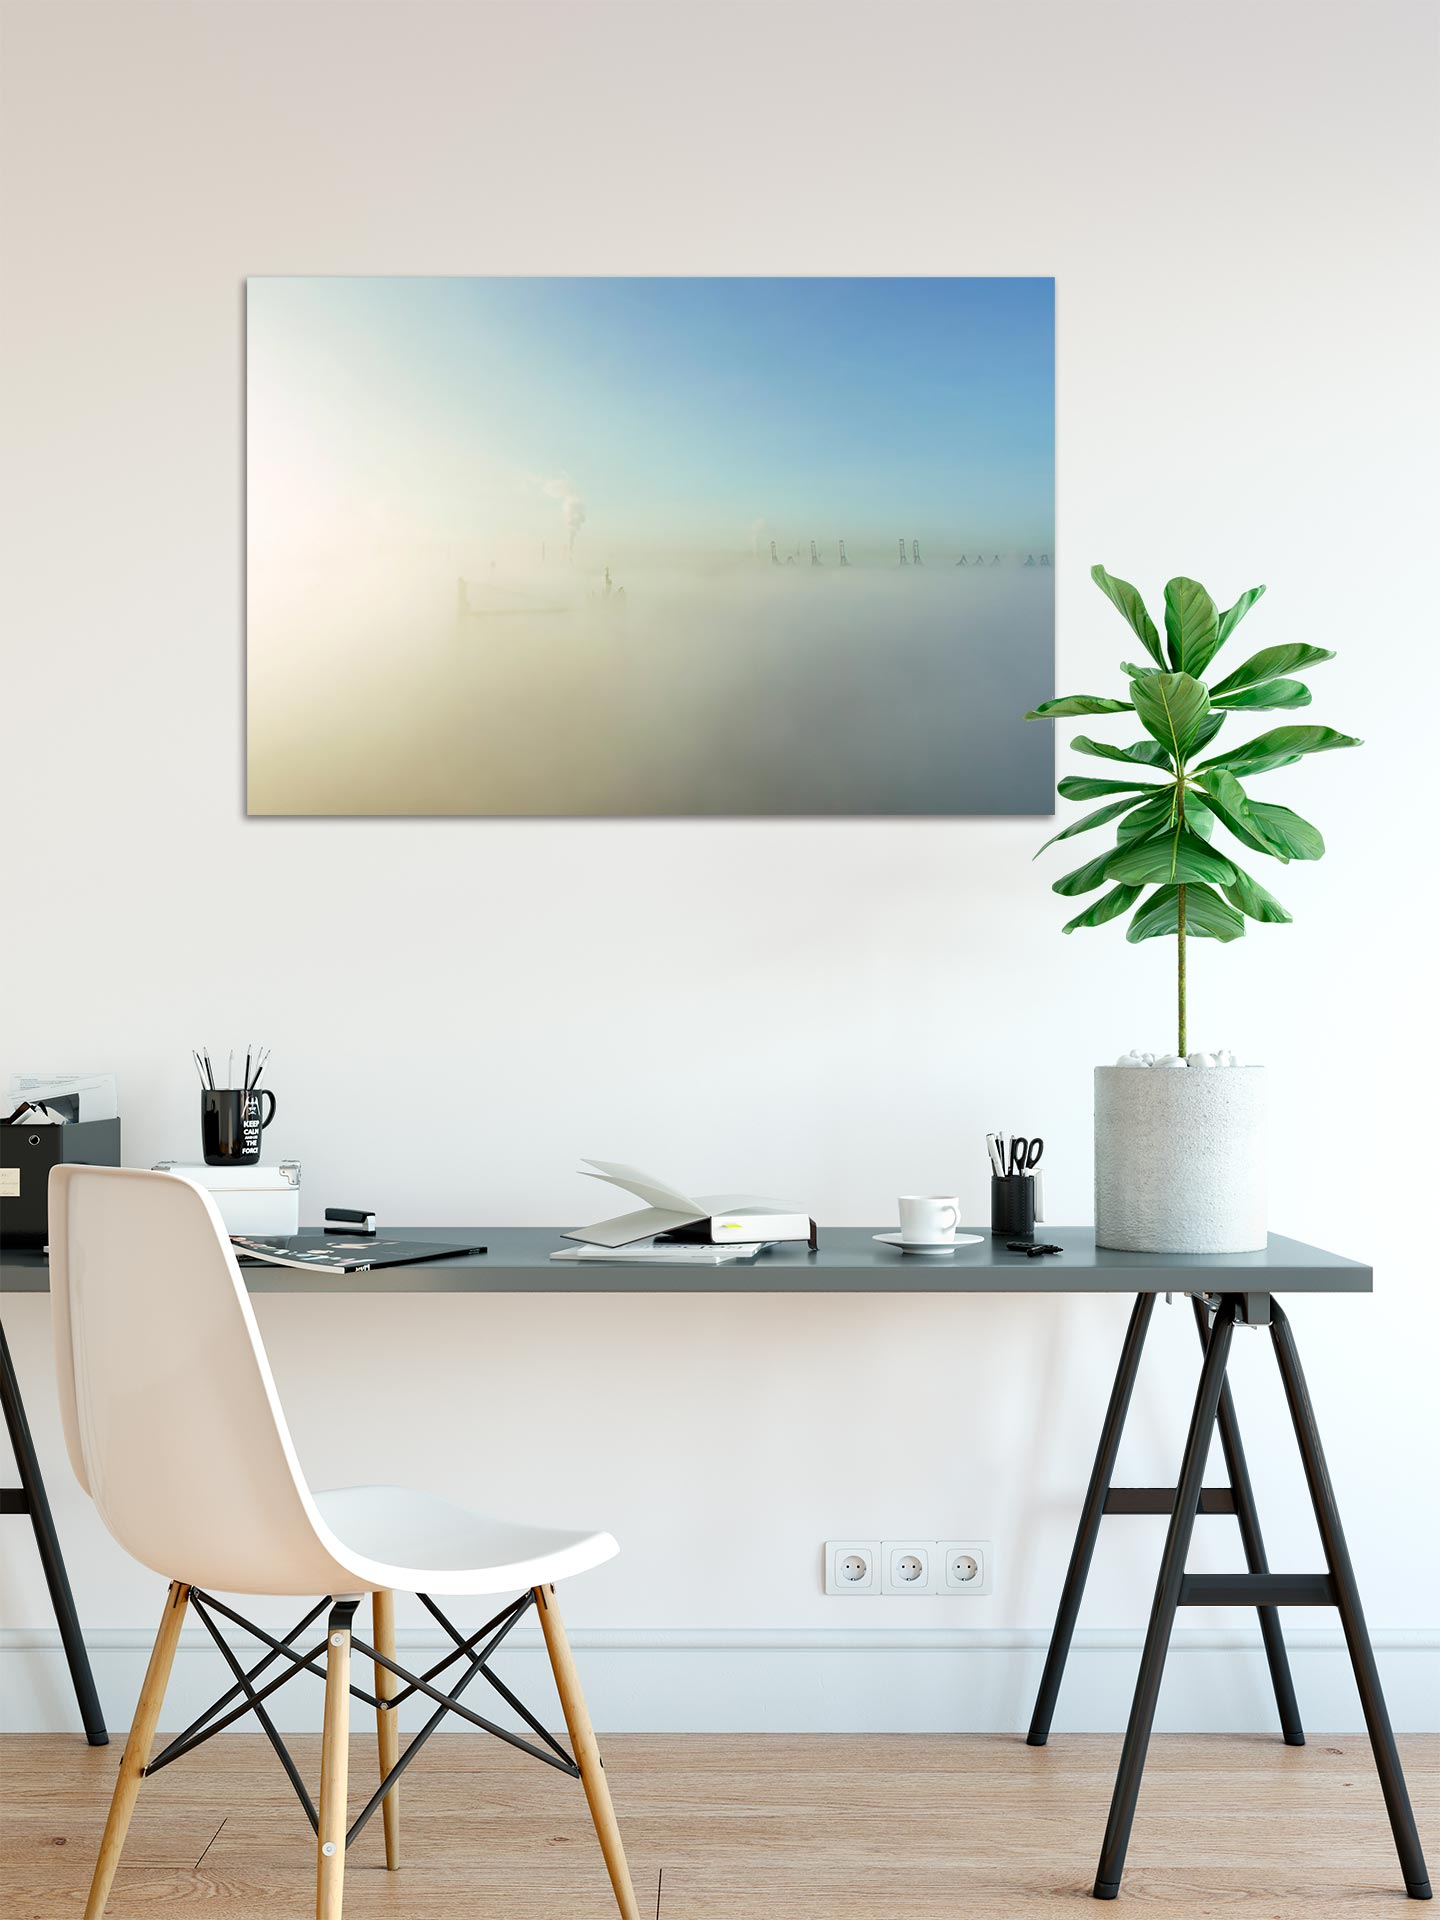 LCW260-nebelgiraffen-hamburg-wandbild-bild-auf-leinwand-acrylglas-aludibond-arbeitszimmer